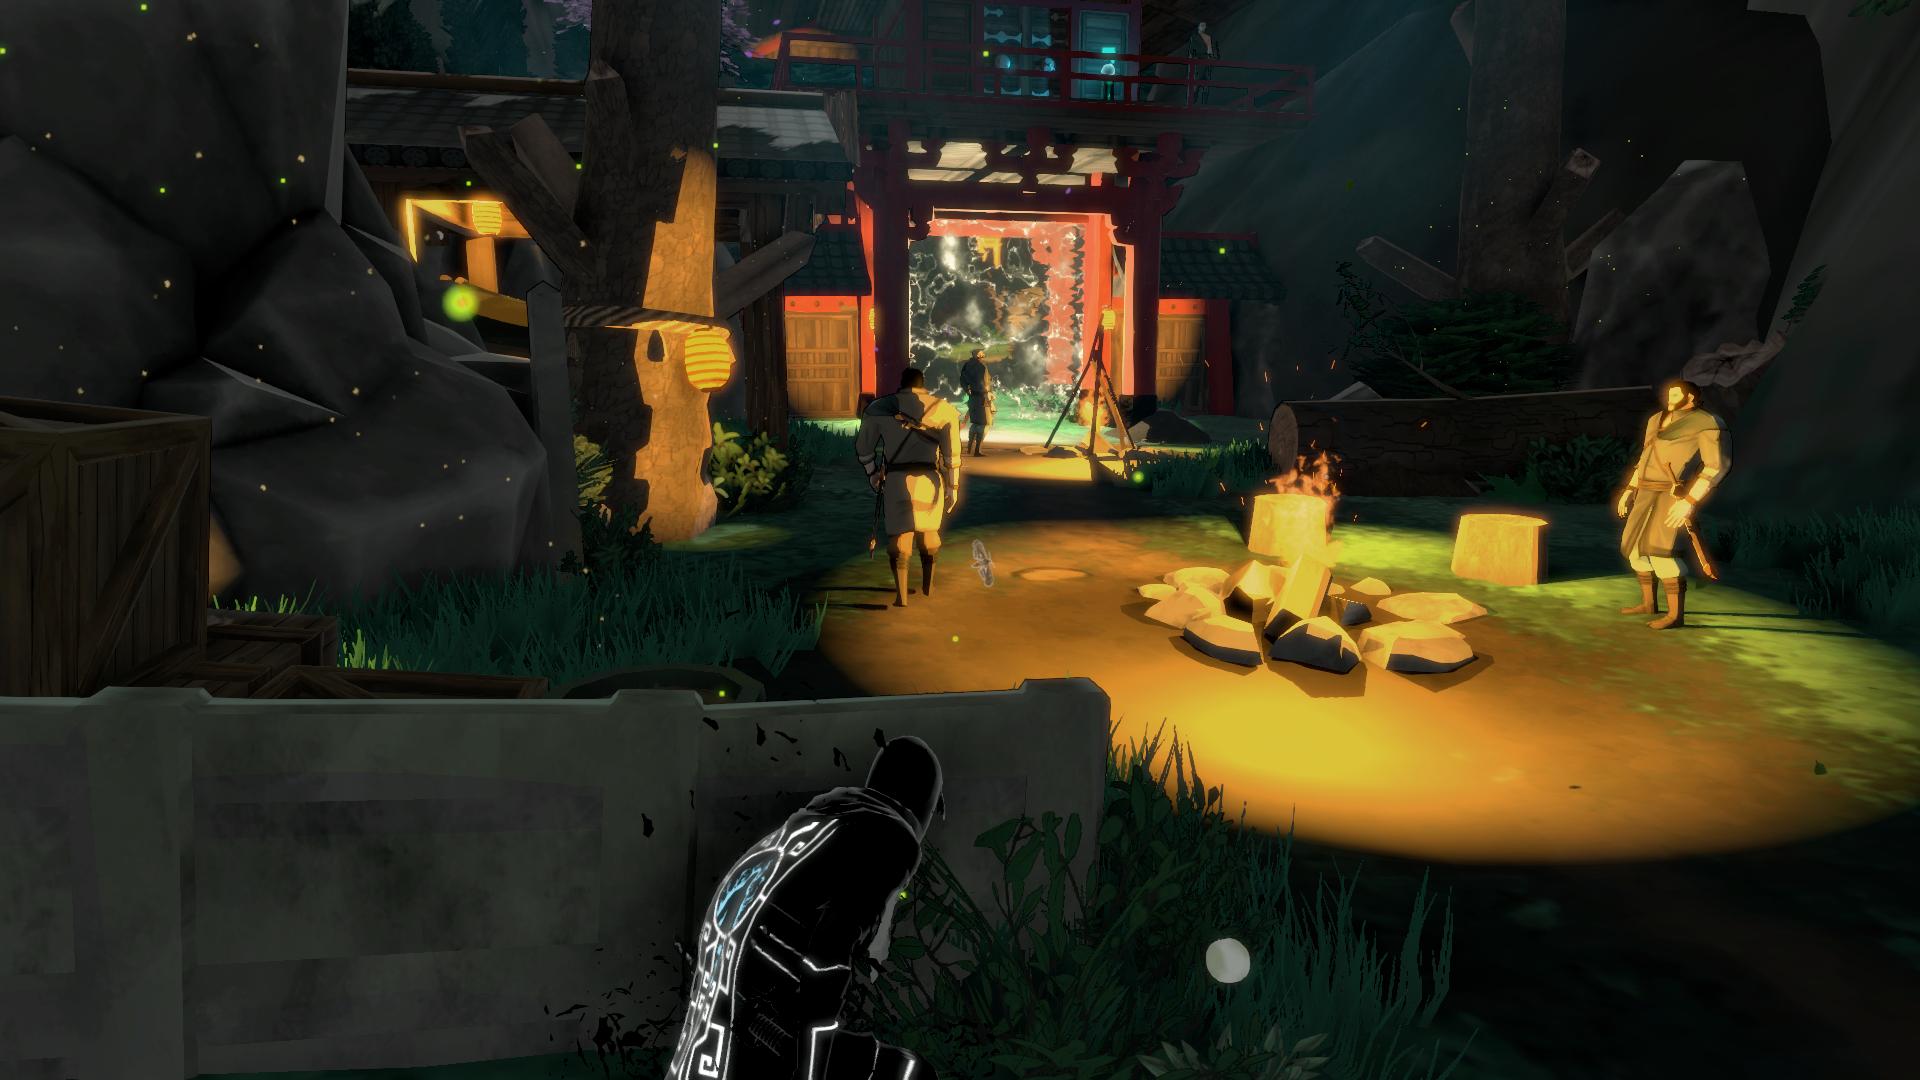 screenshot_gameplay_02.png